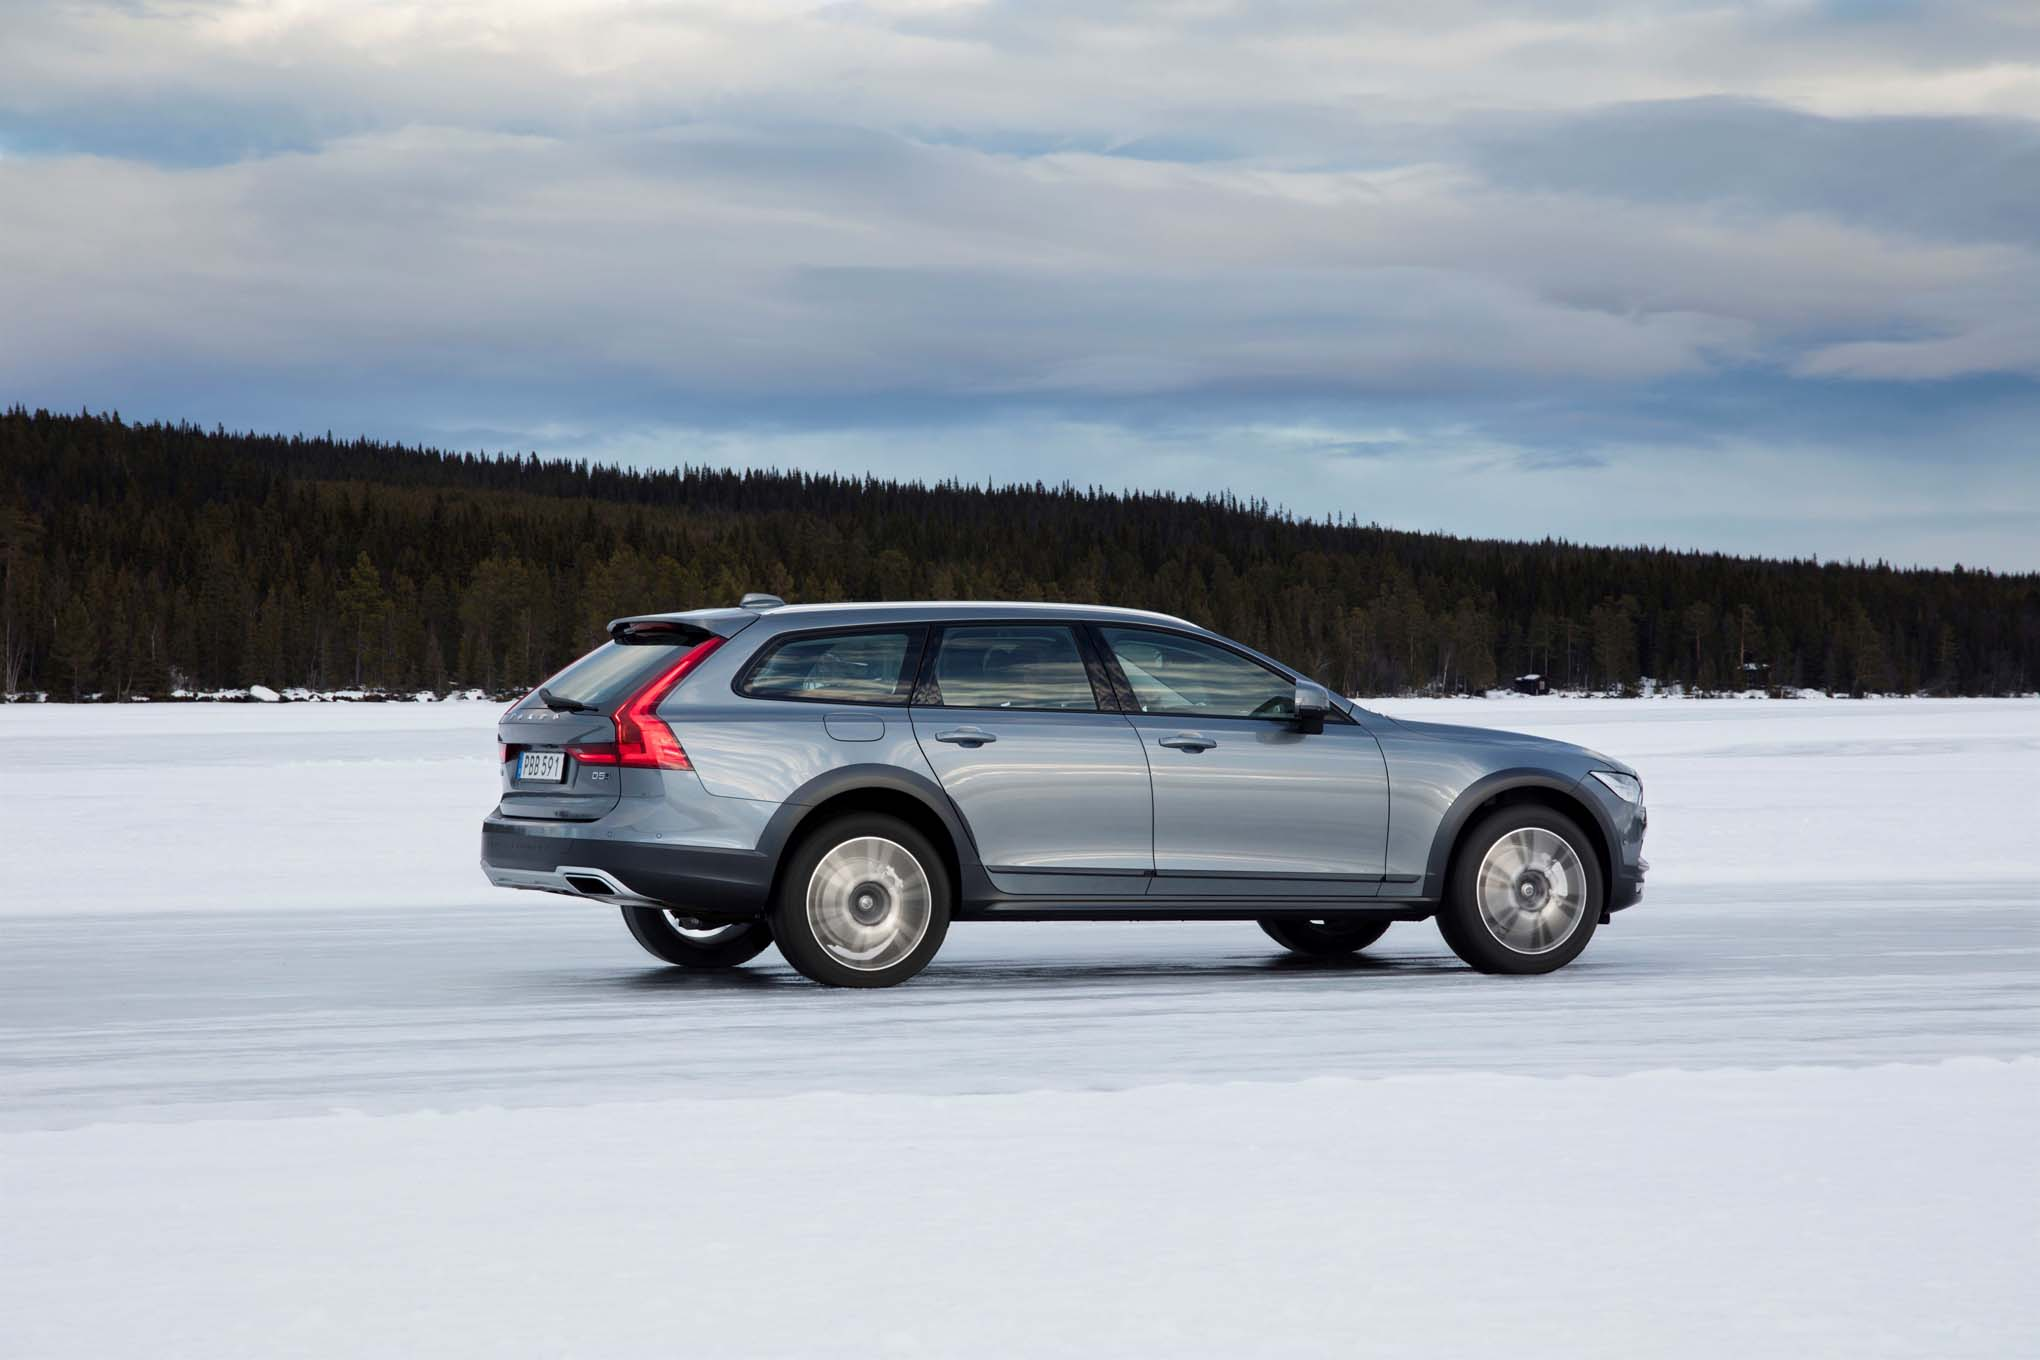 2017 Volvo V90 Cross Country rear side in motion